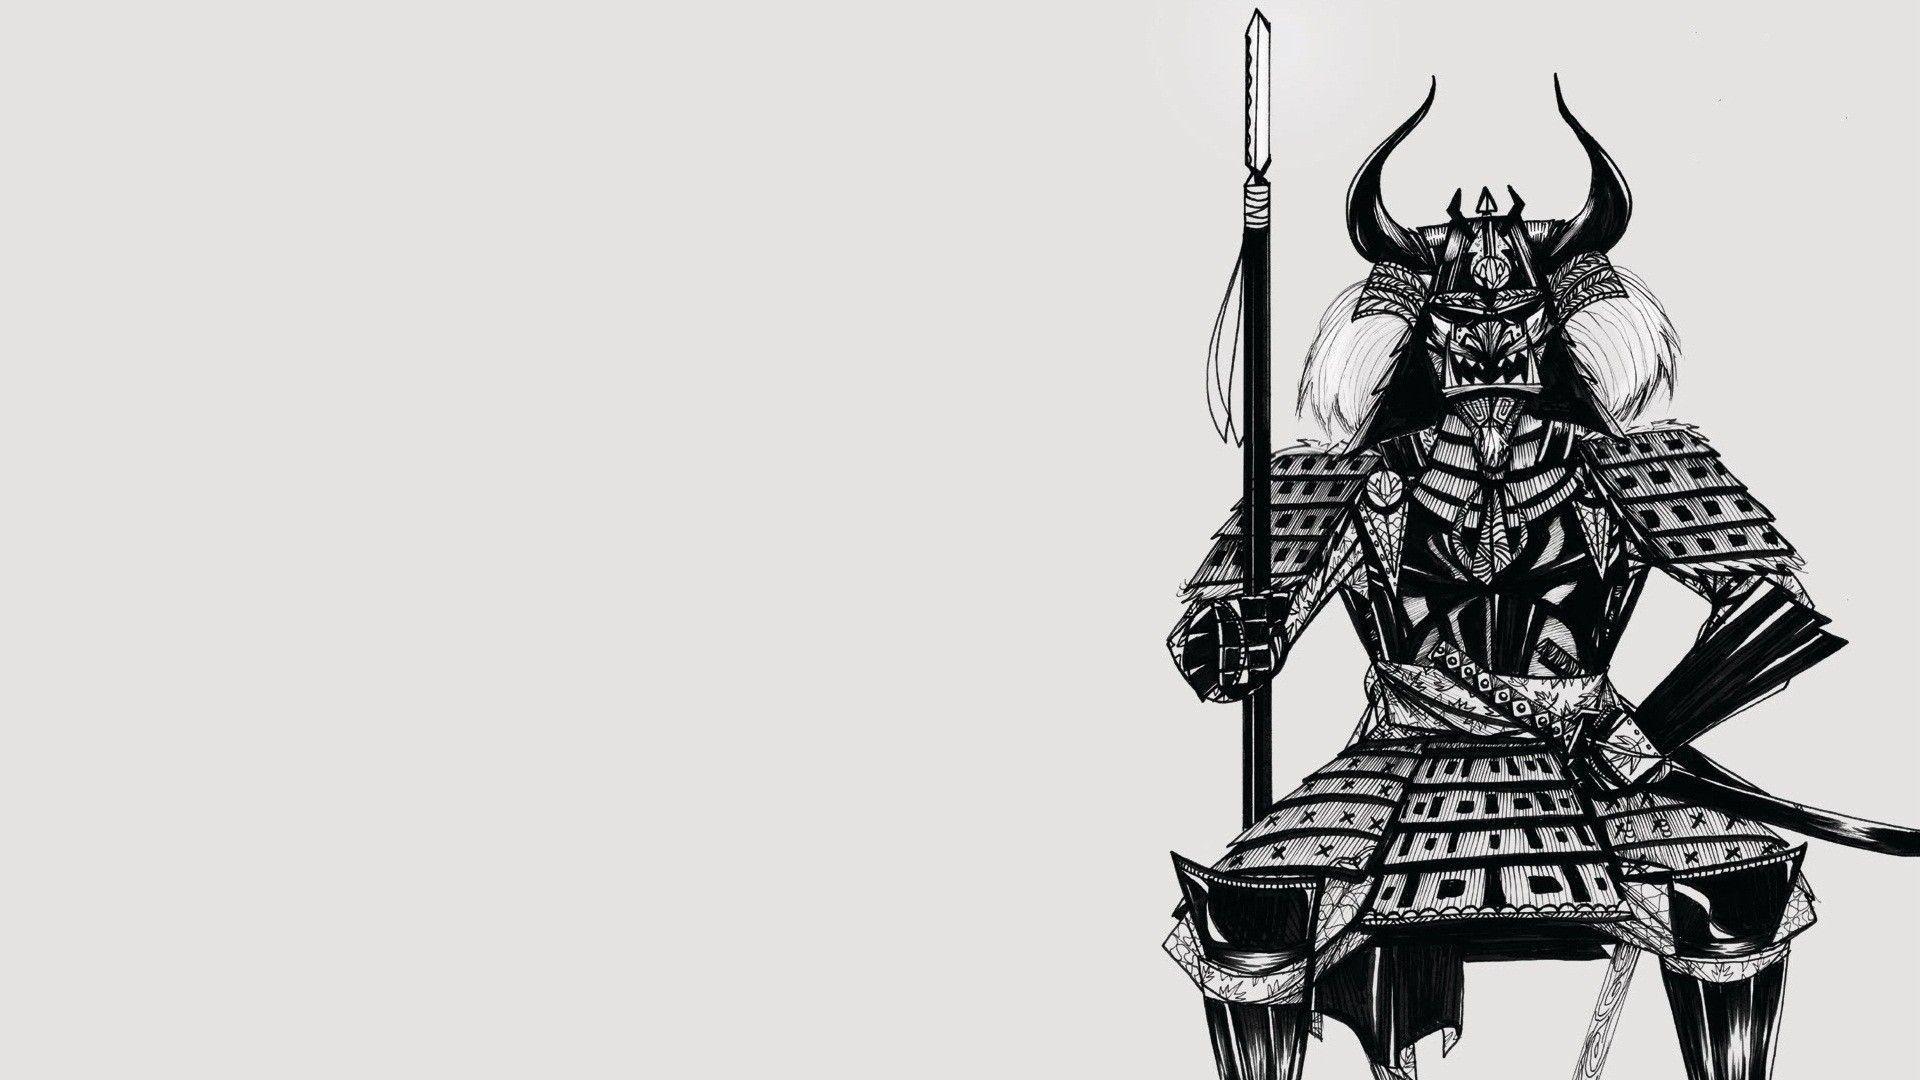 Samurai Helmet Iphone Wallpapers Top Free Samurai Helmet Iphone